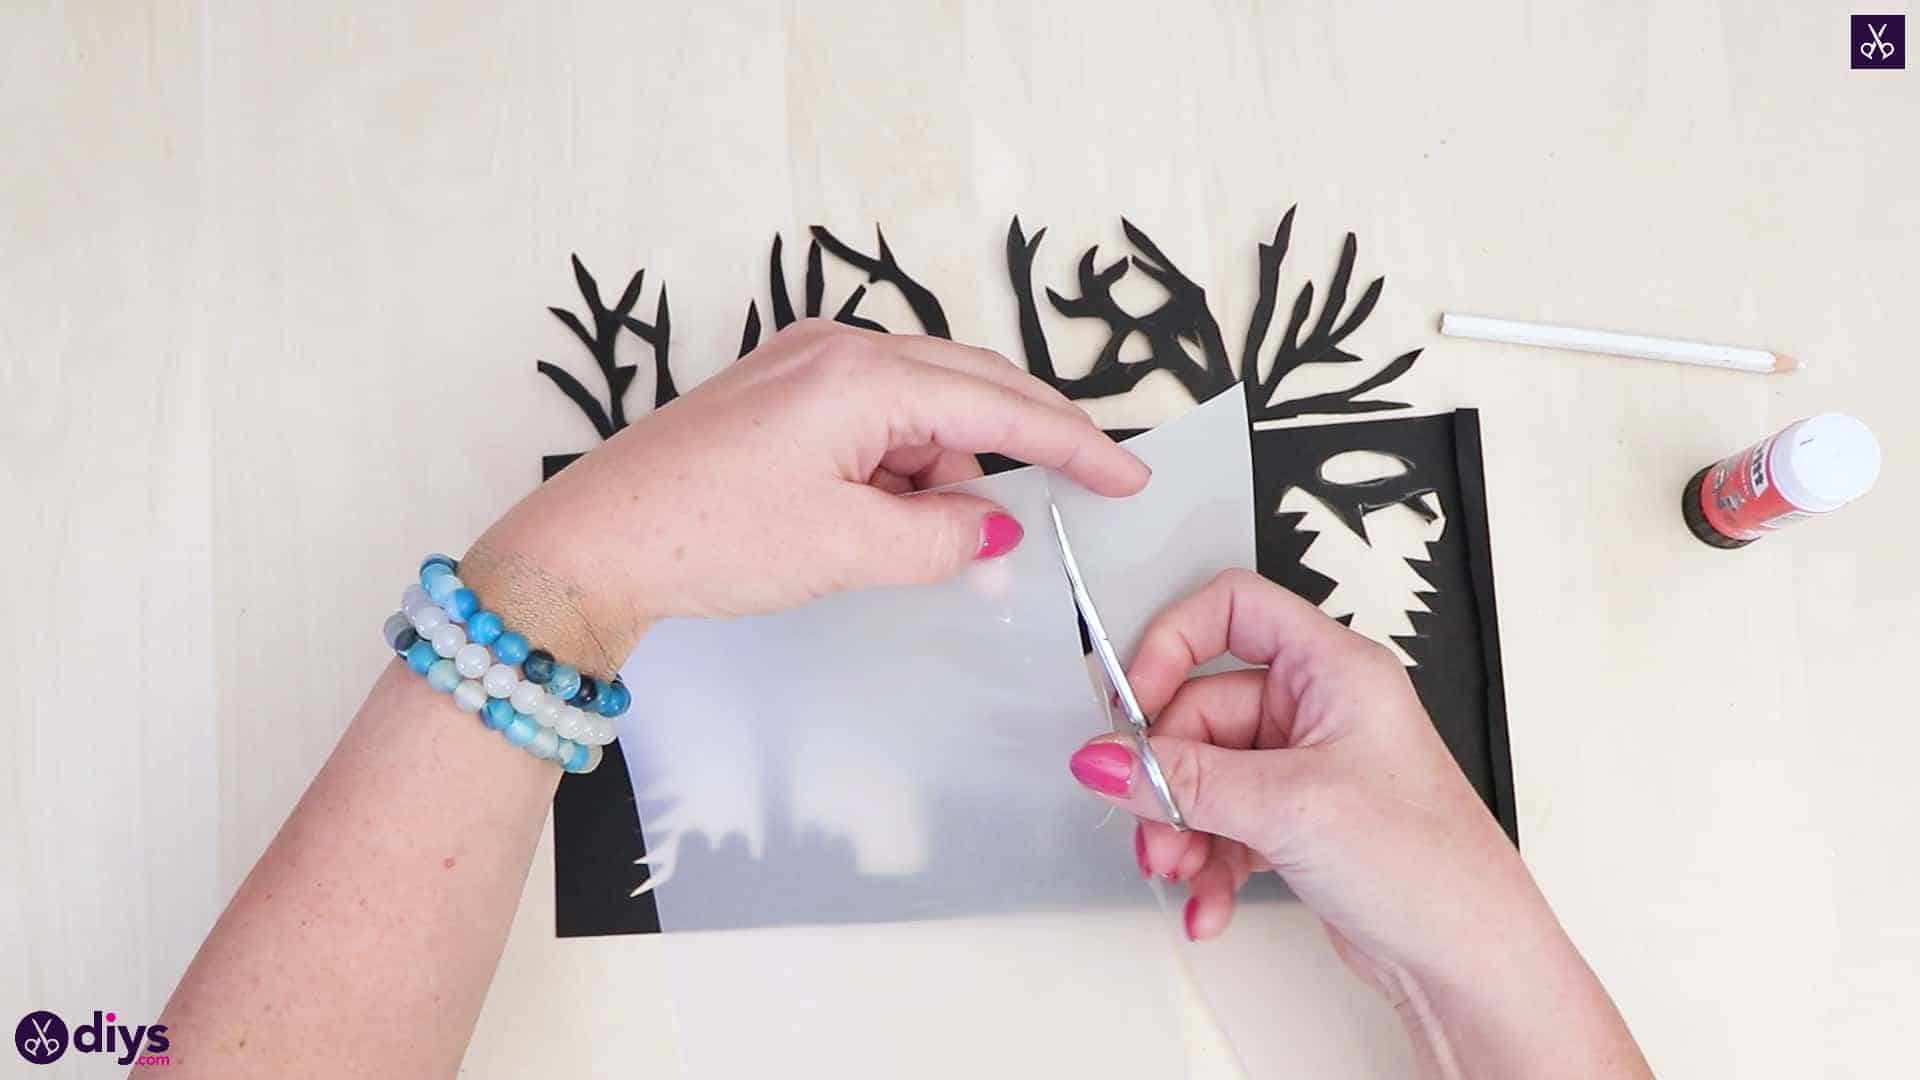 Diy paper lantern art press1